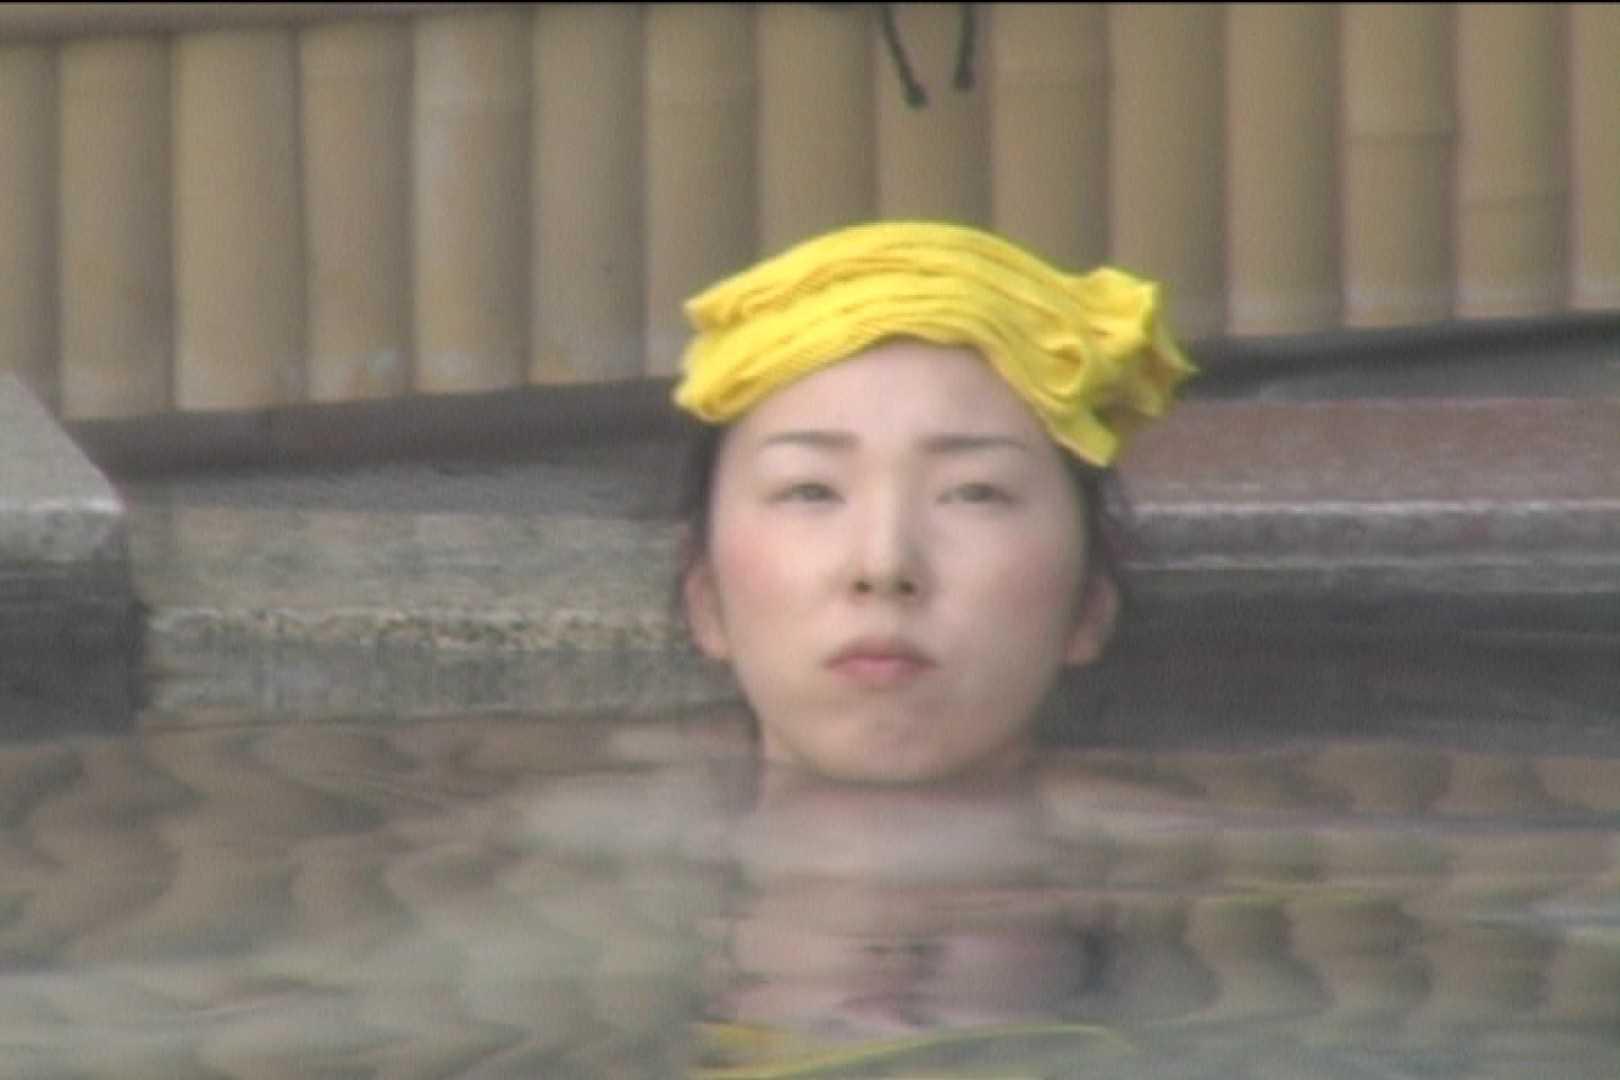 Aquaな露天風呂Vol.529 盗撮シリーズ | 露天風呂編  106PIX 103